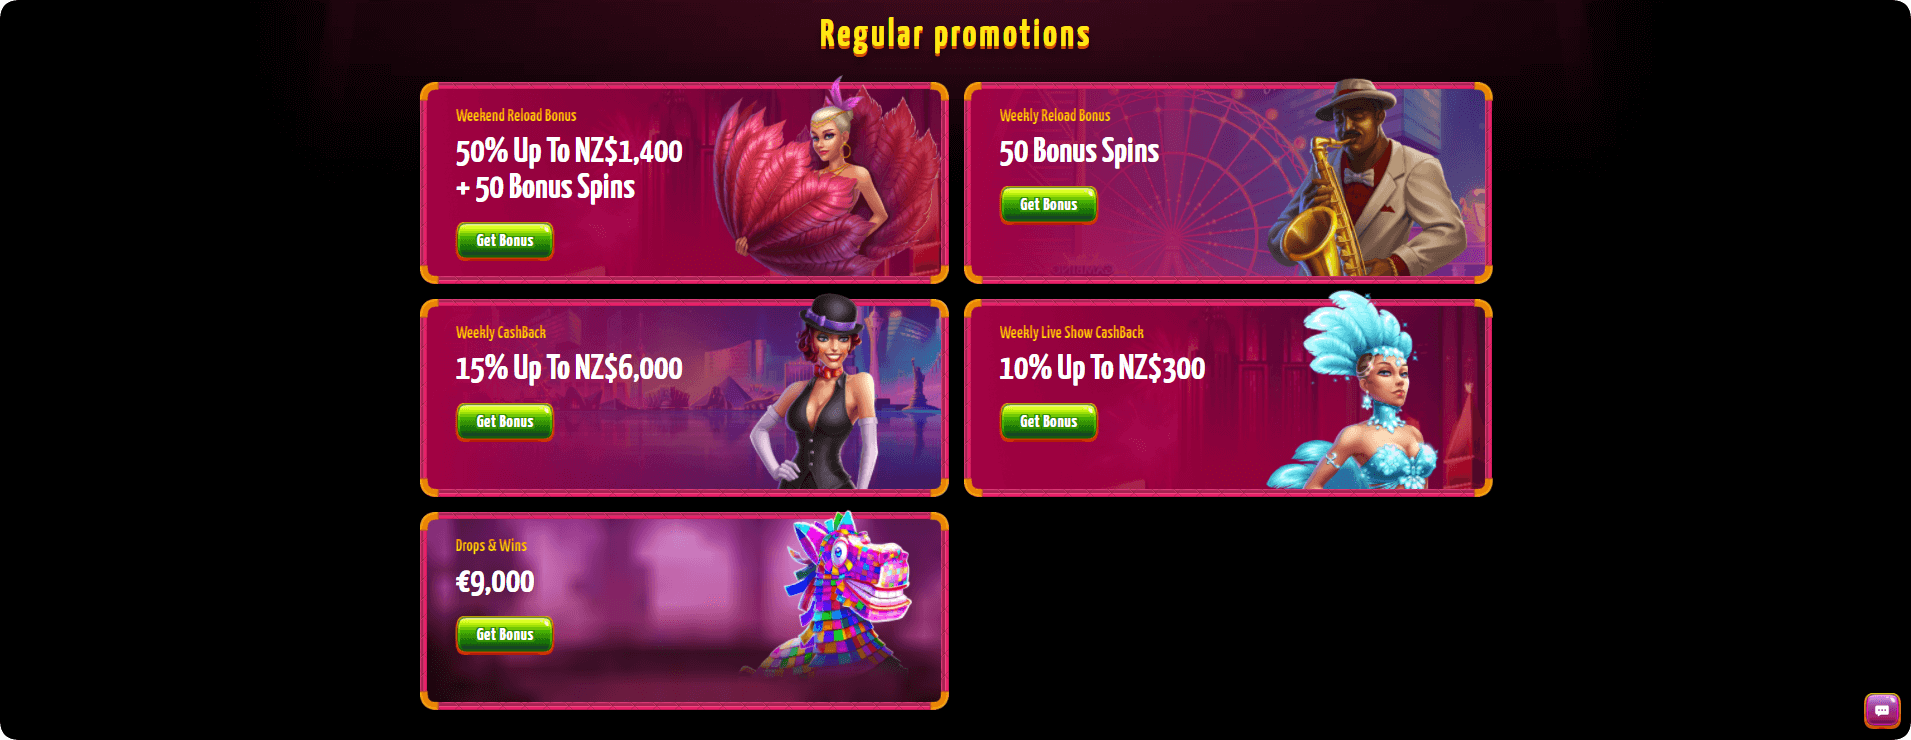 Promotions Winota